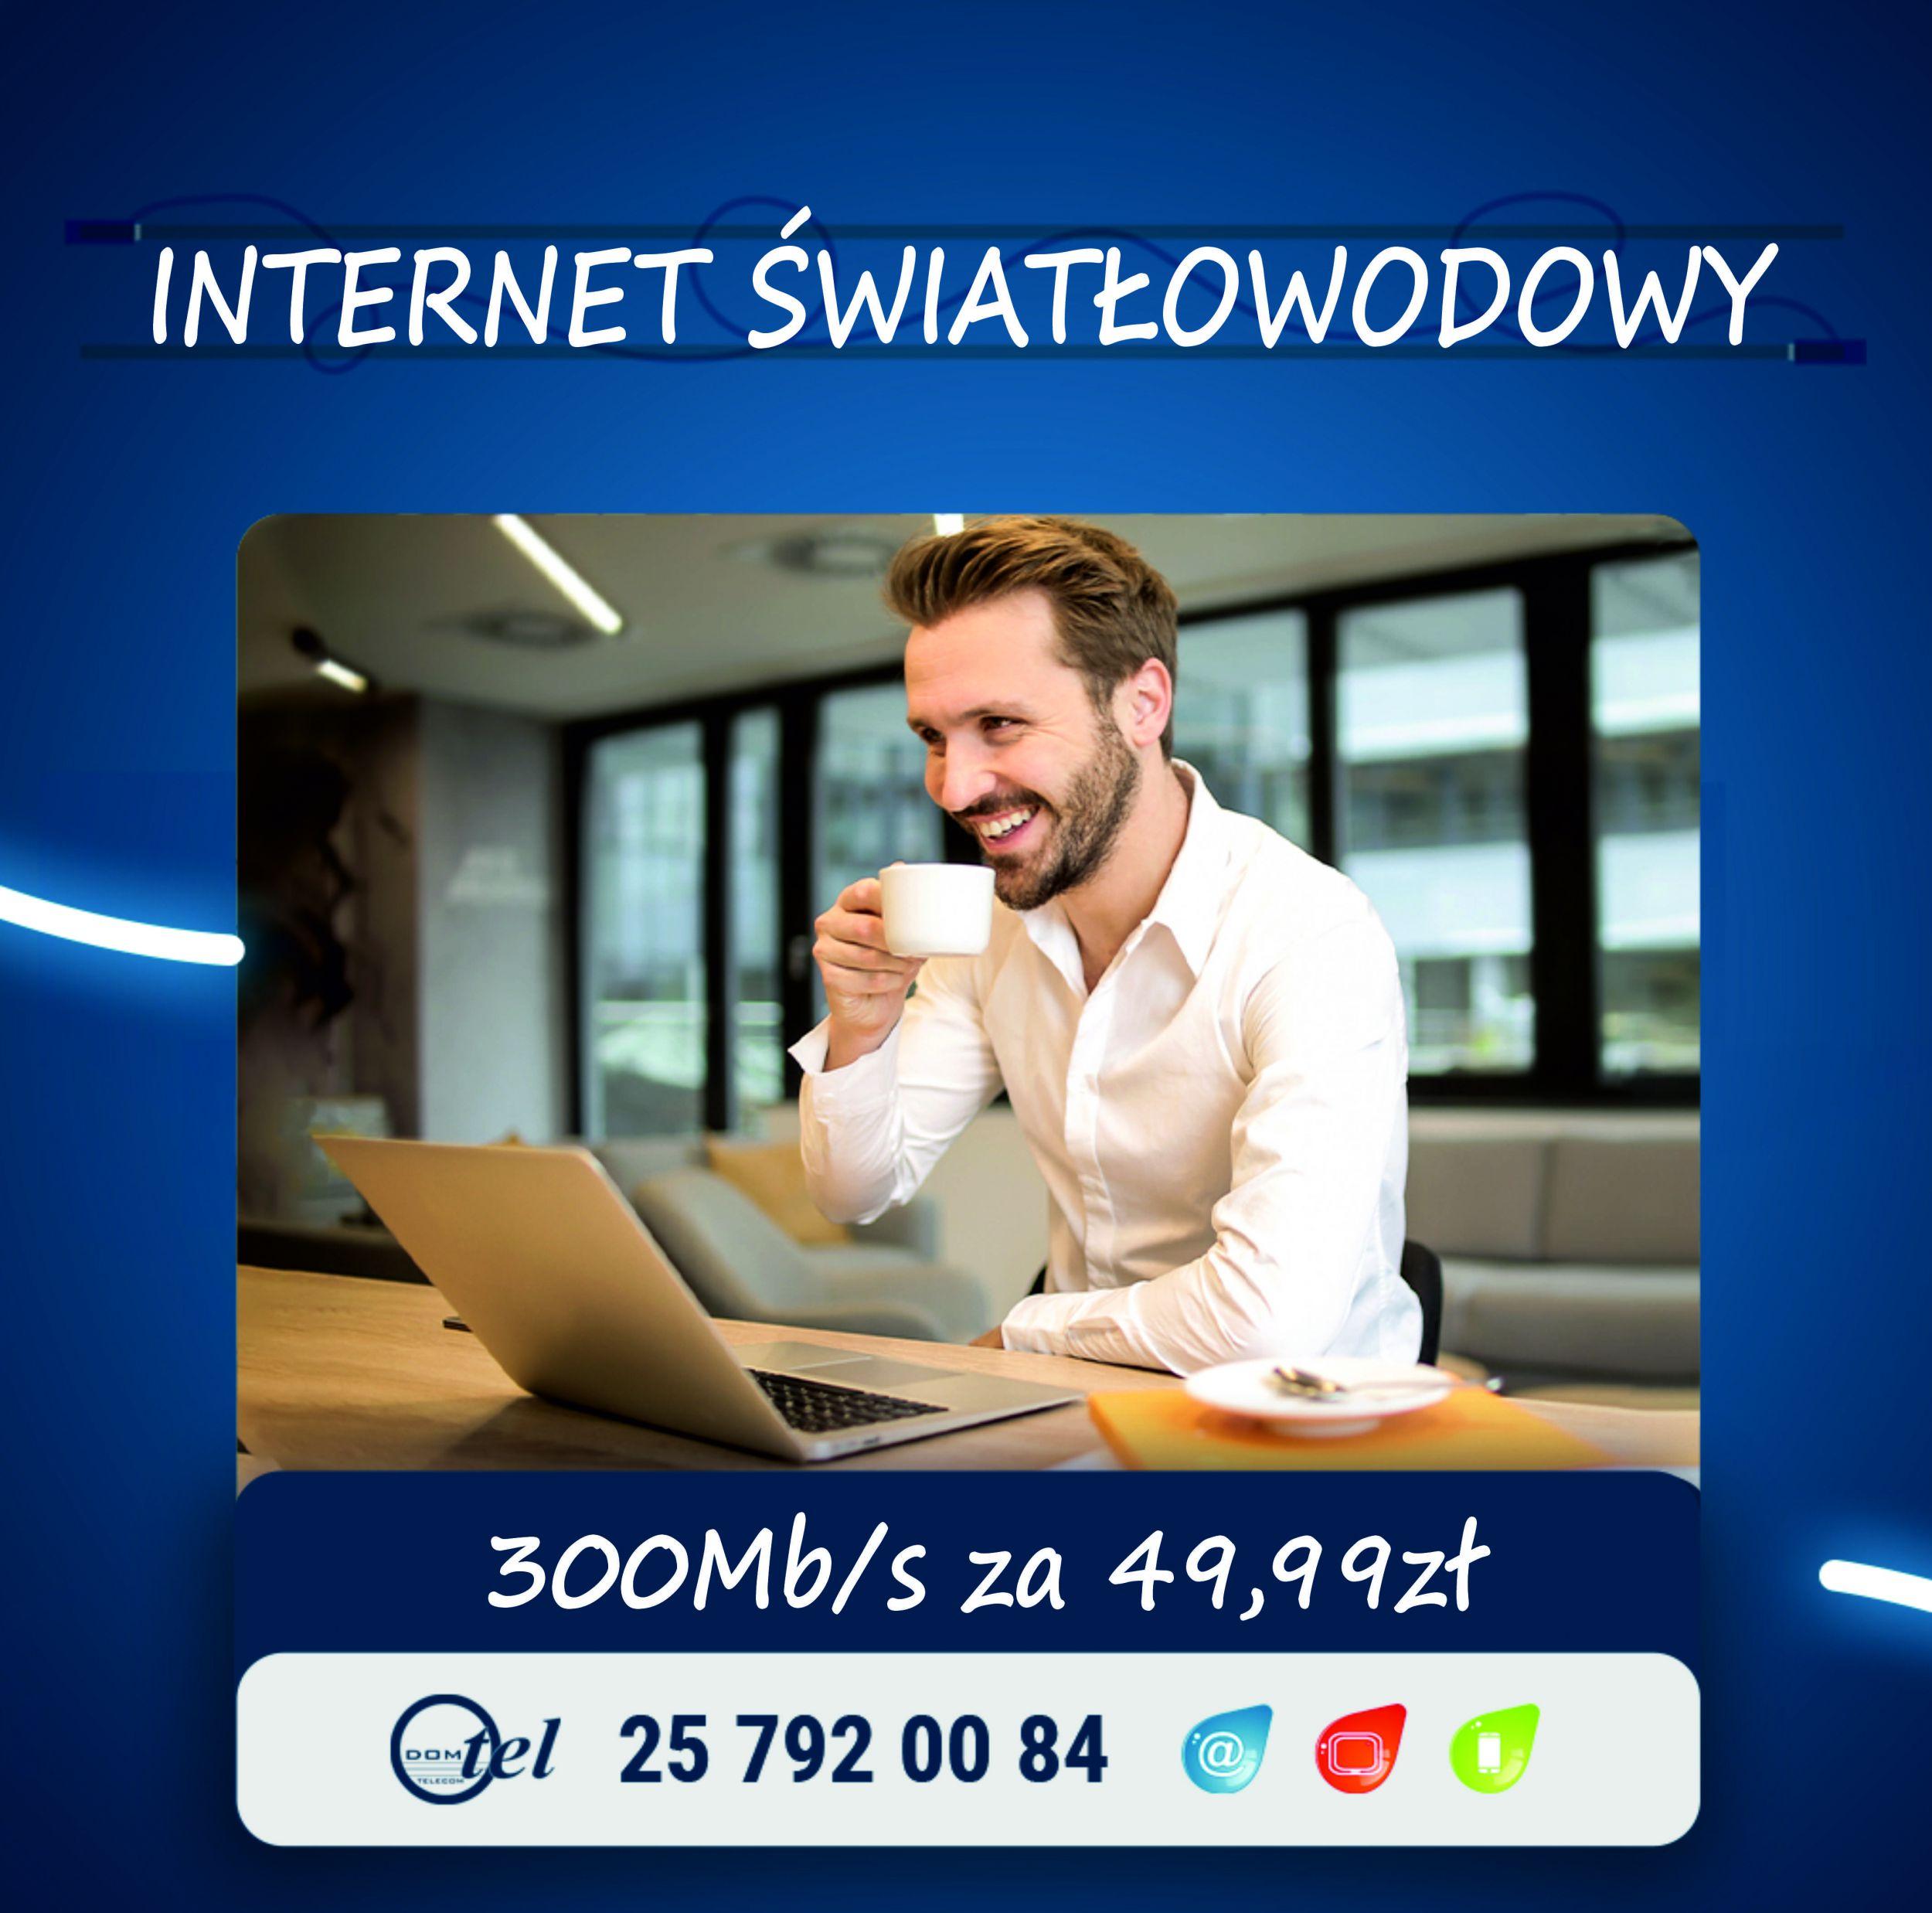 Internet 300Mb/s - 49,99zł